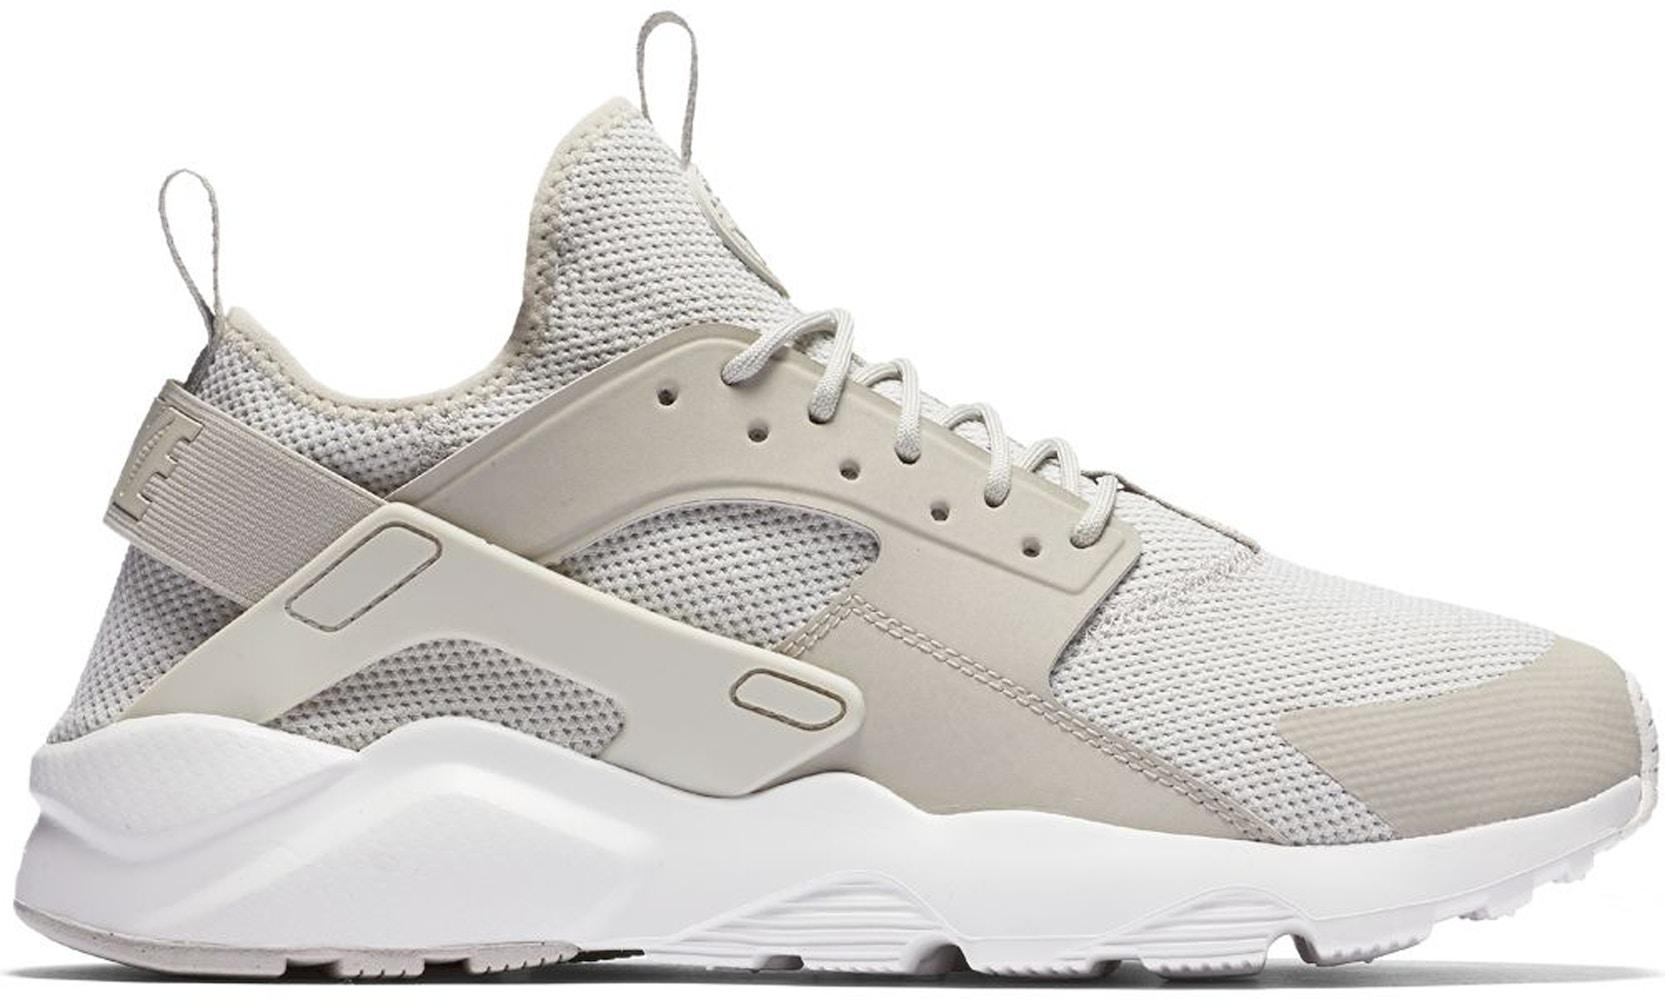 Nike Air Huarache Run Ultra Breathe Pale Grey - 833147-002